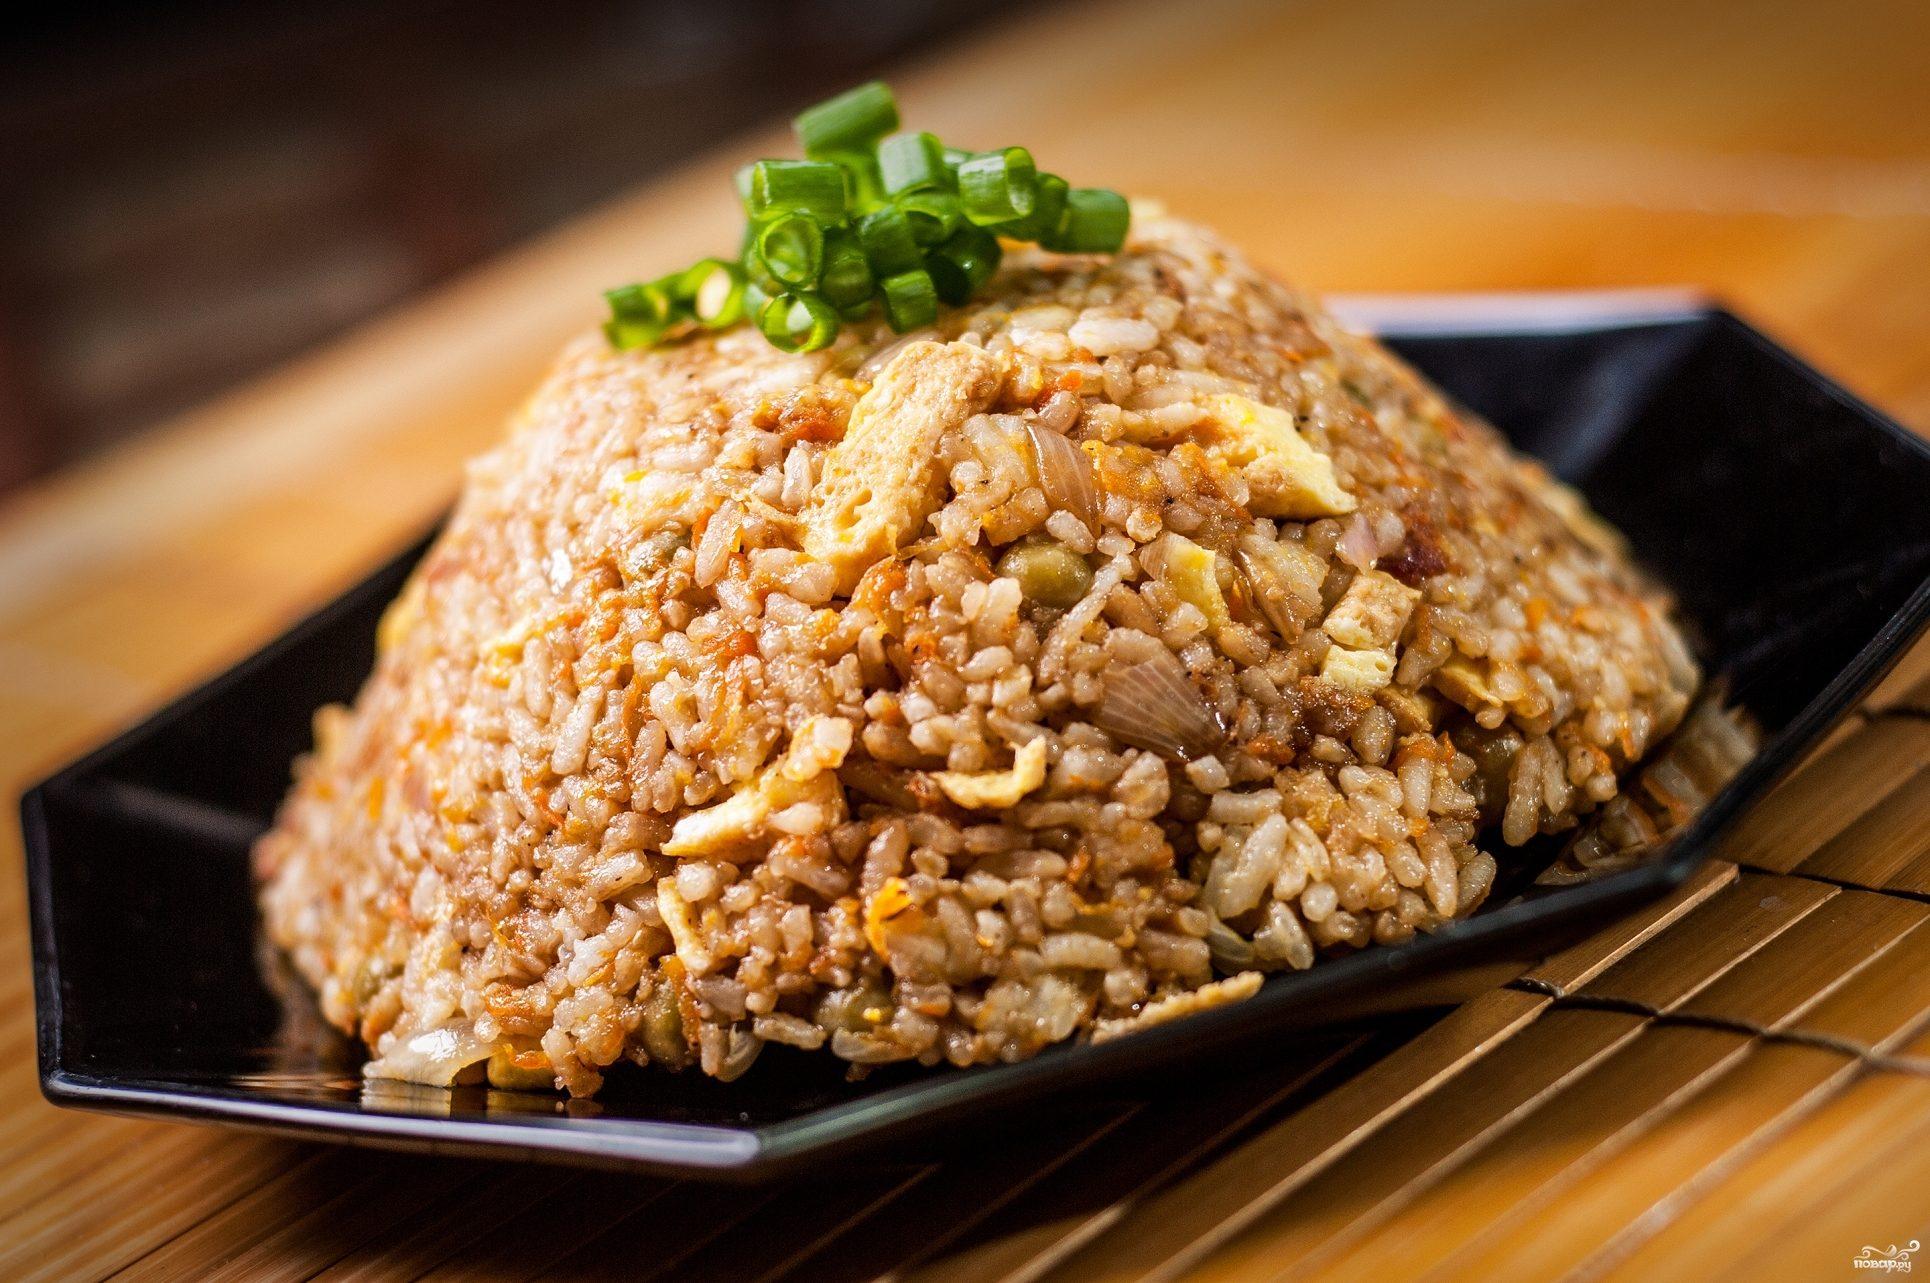 курица китайская кухня рецепты с фото